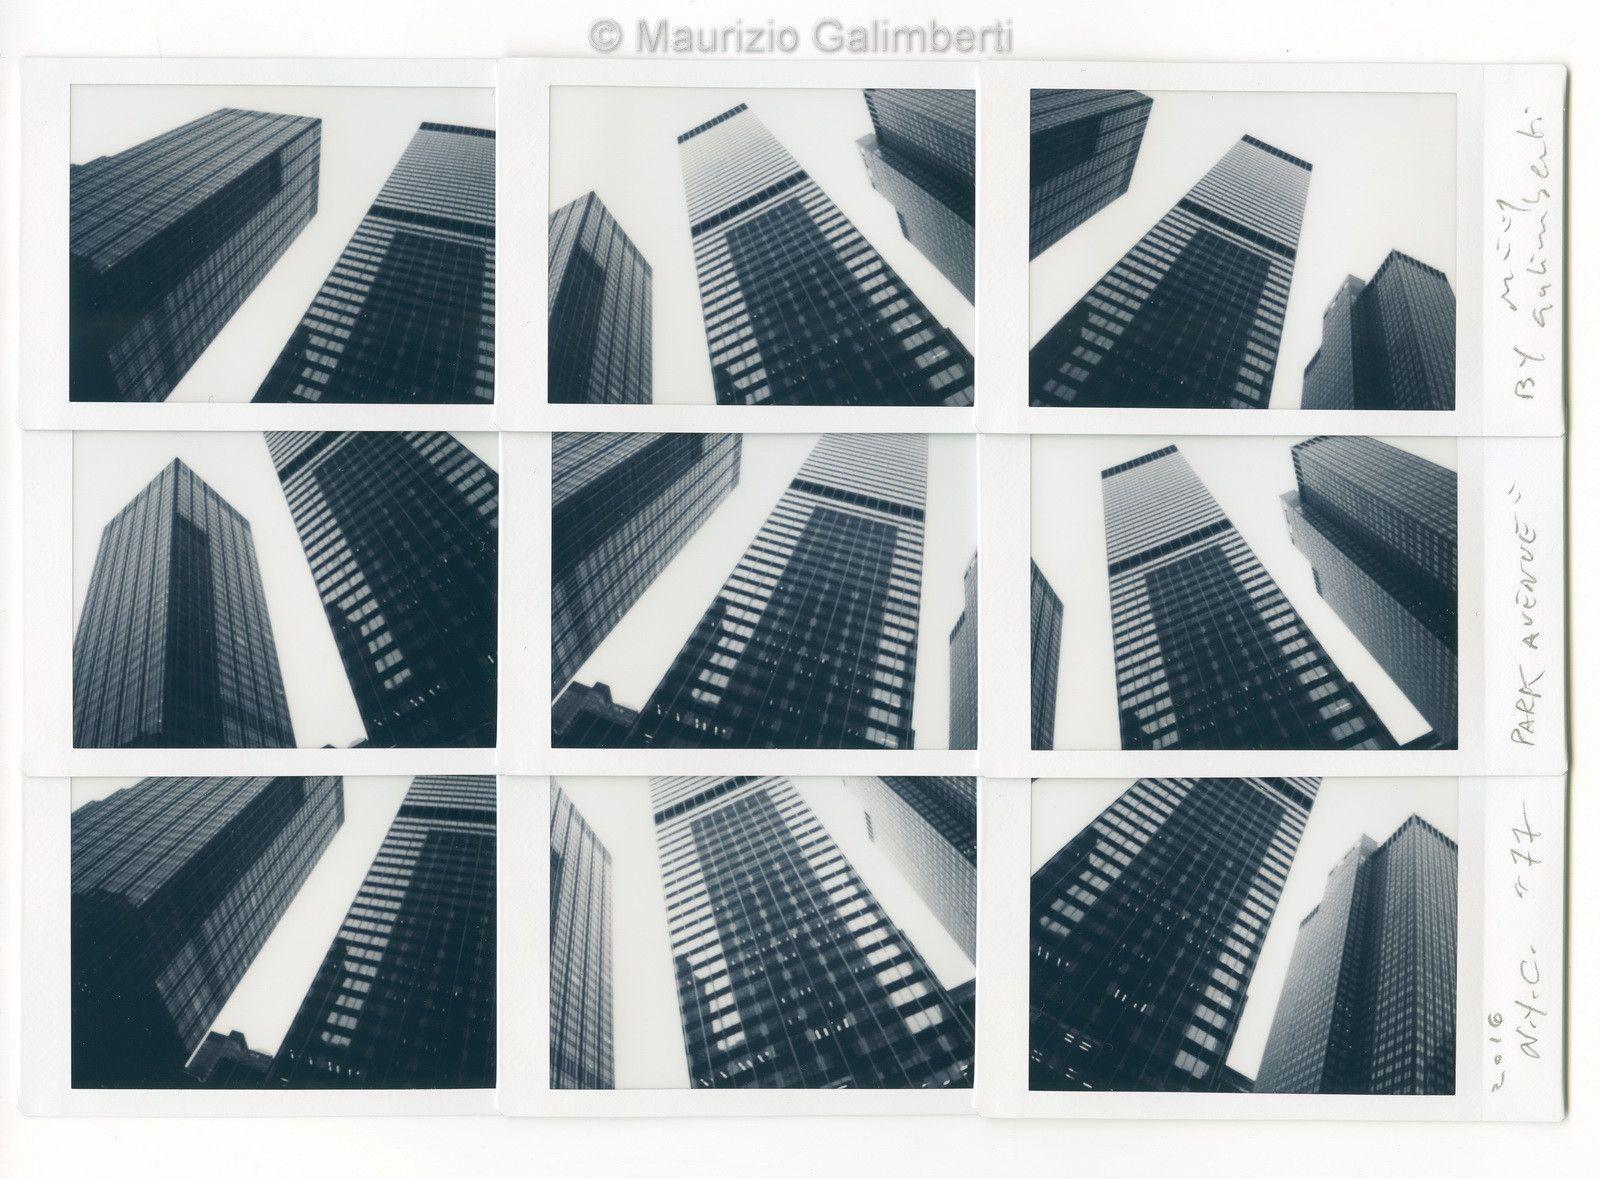 VINTAGE POLAROID MAURIZIO GALIMBERTI 'PARK AVENUE' dimensioni cm. 46x39